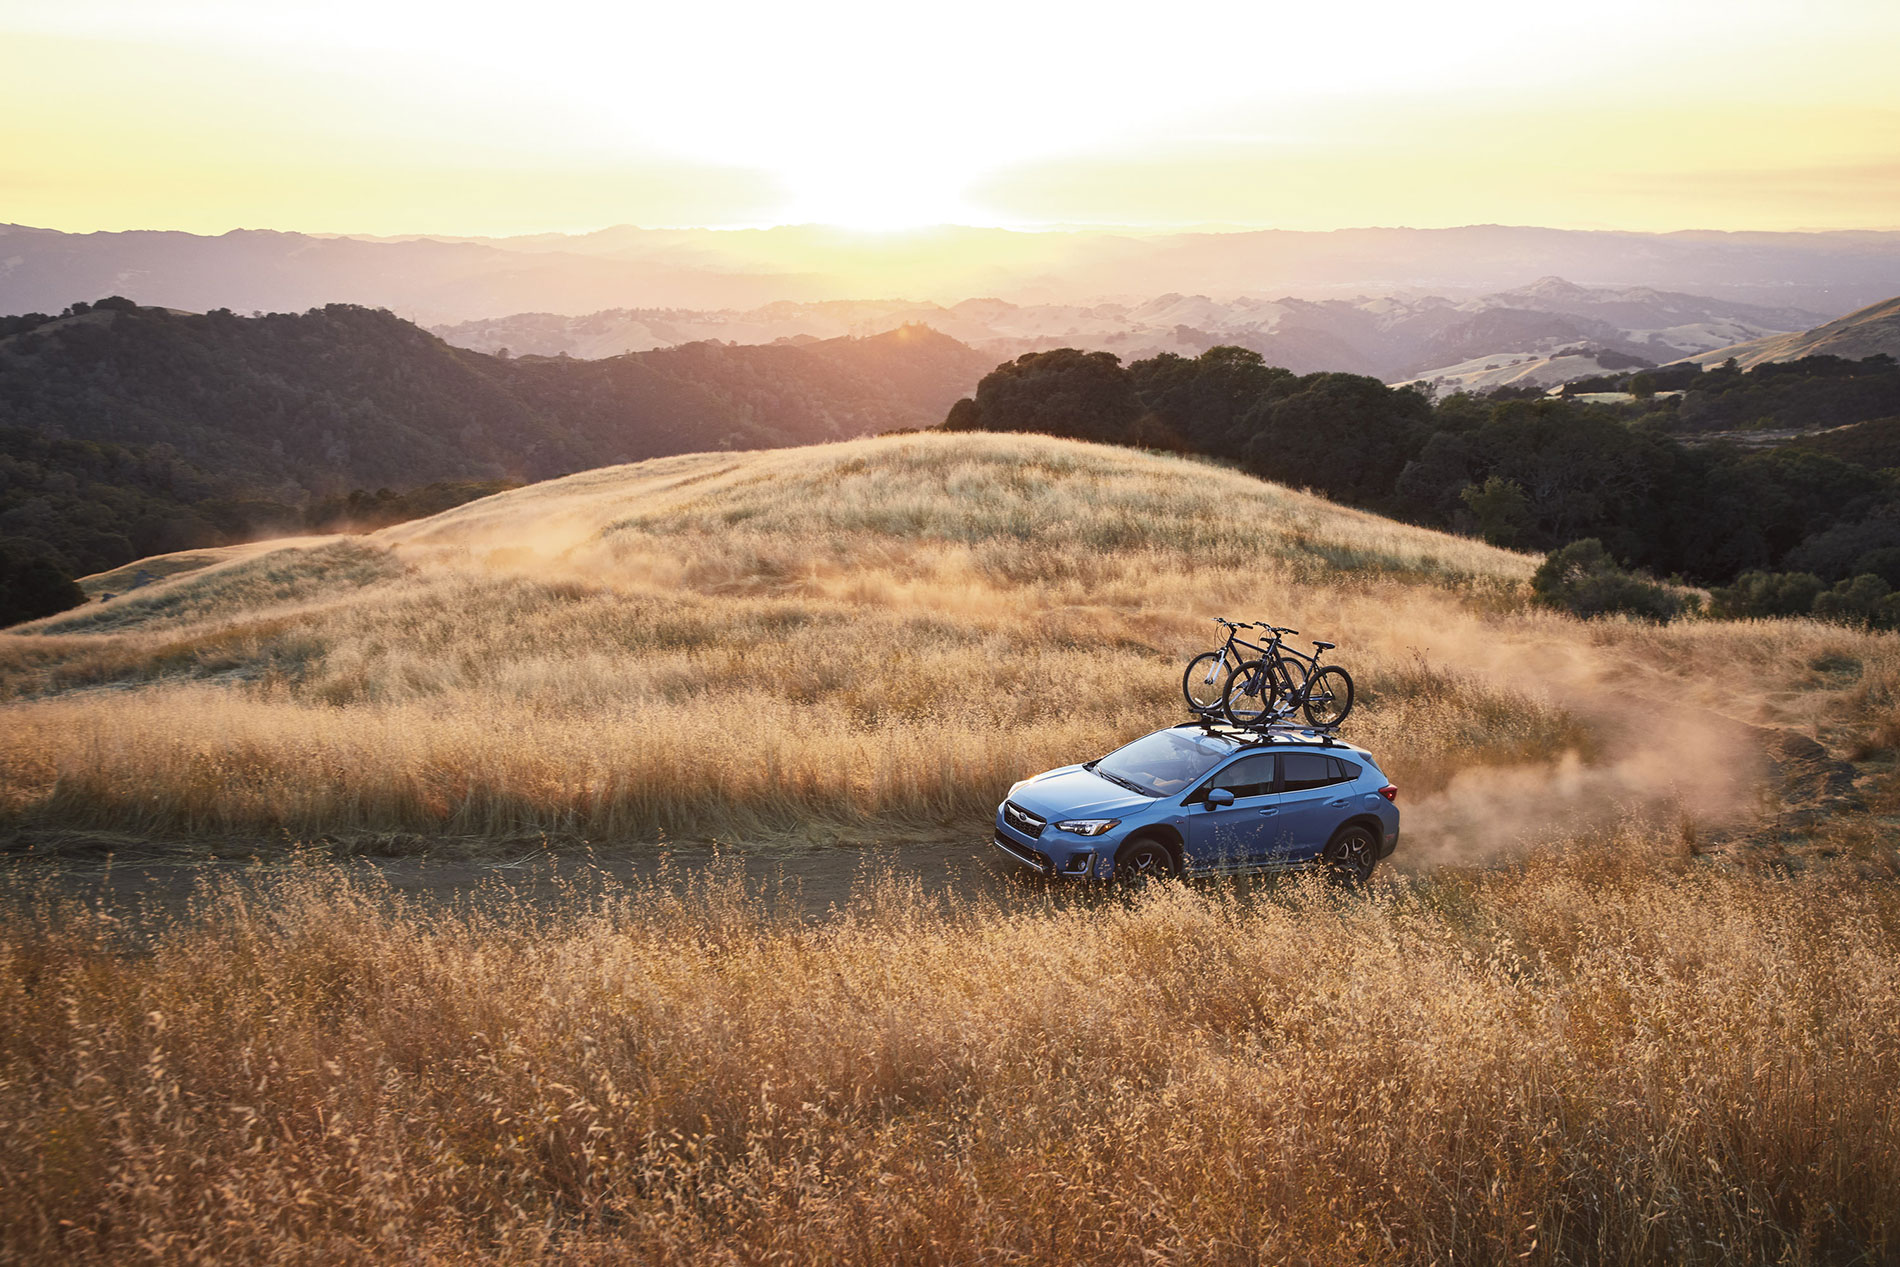 CLIENT – SUBARU CROSSTREK PHOTOGRAPHER – JEFF STOCKWELL ADVERTISING AGENCY – THE DESIGNORY LOCATION – SAN FRANCISCO, CA